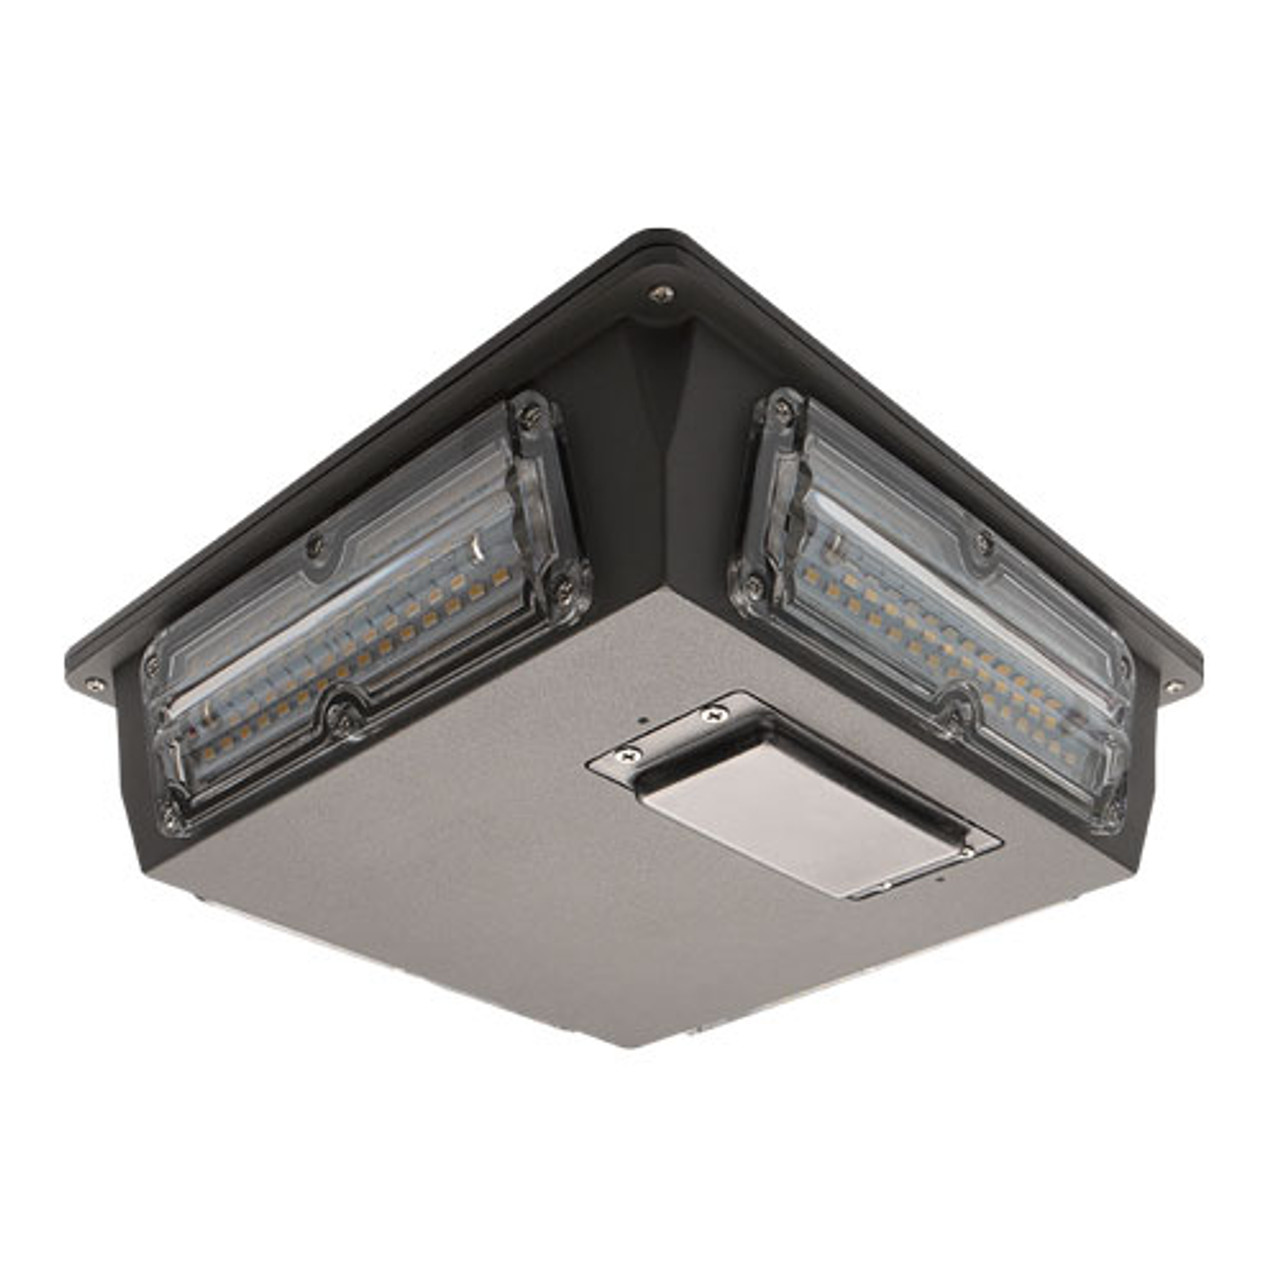 Square 60 Watt LED Parking Garage Light